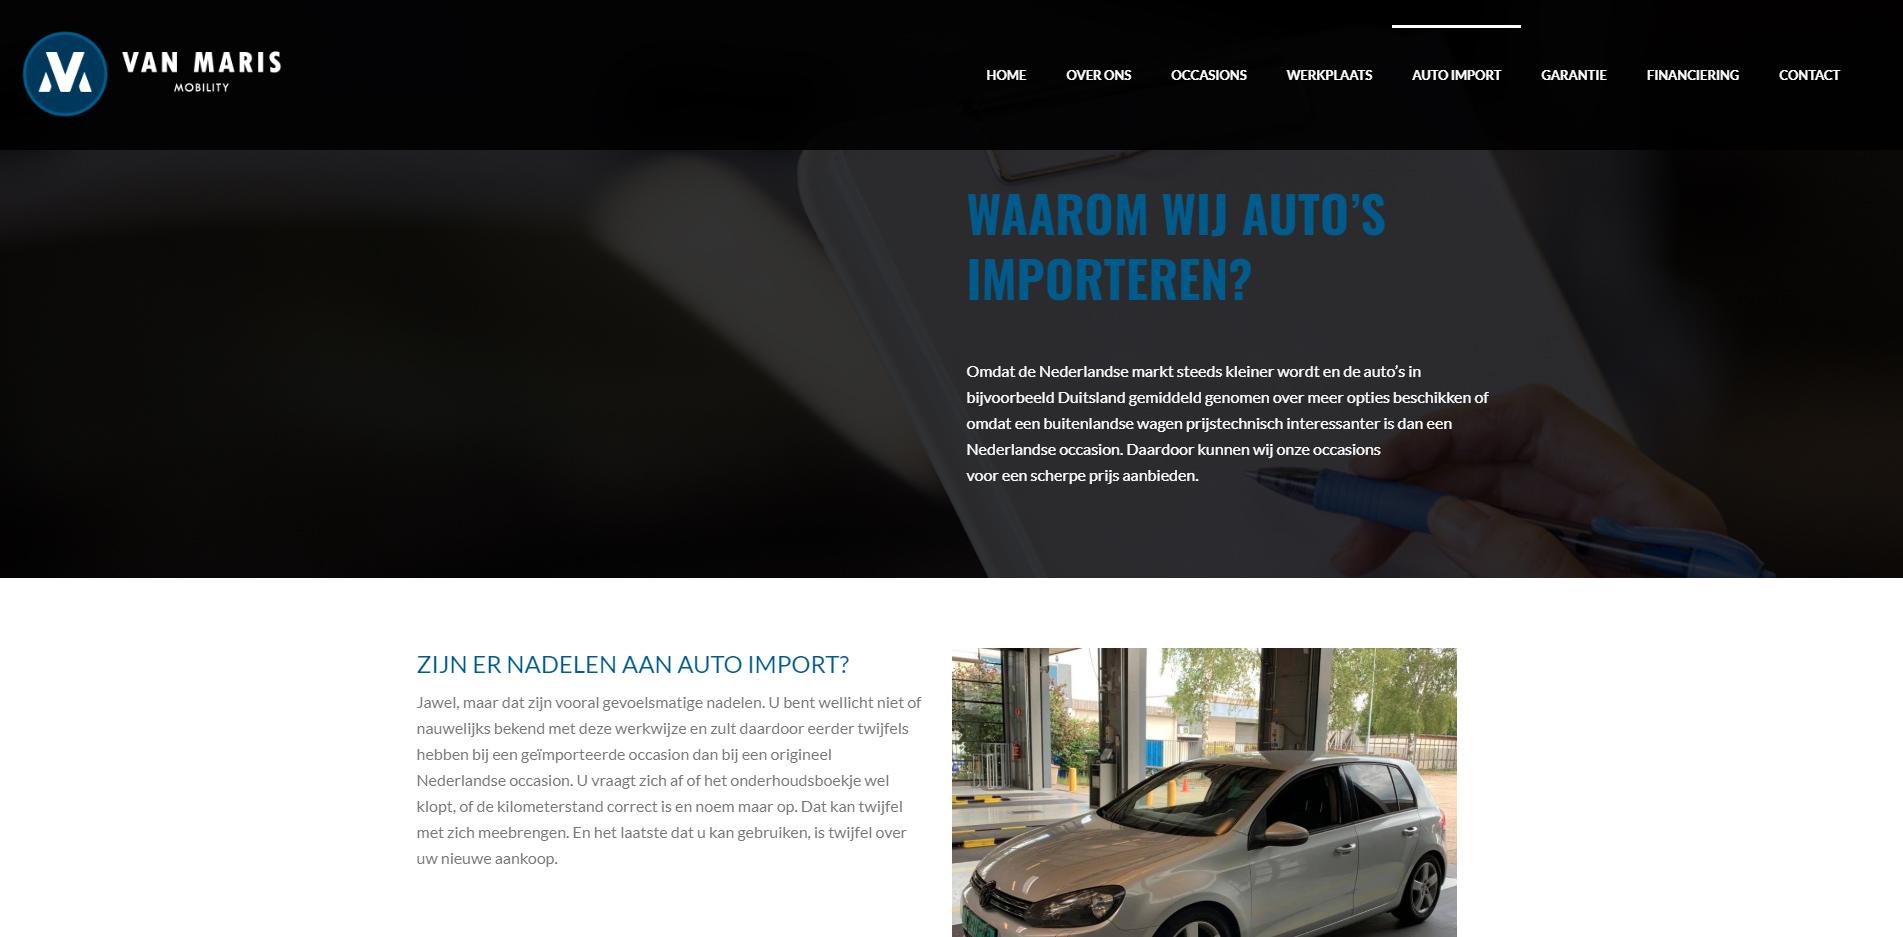 vanmarismobility-autoimport